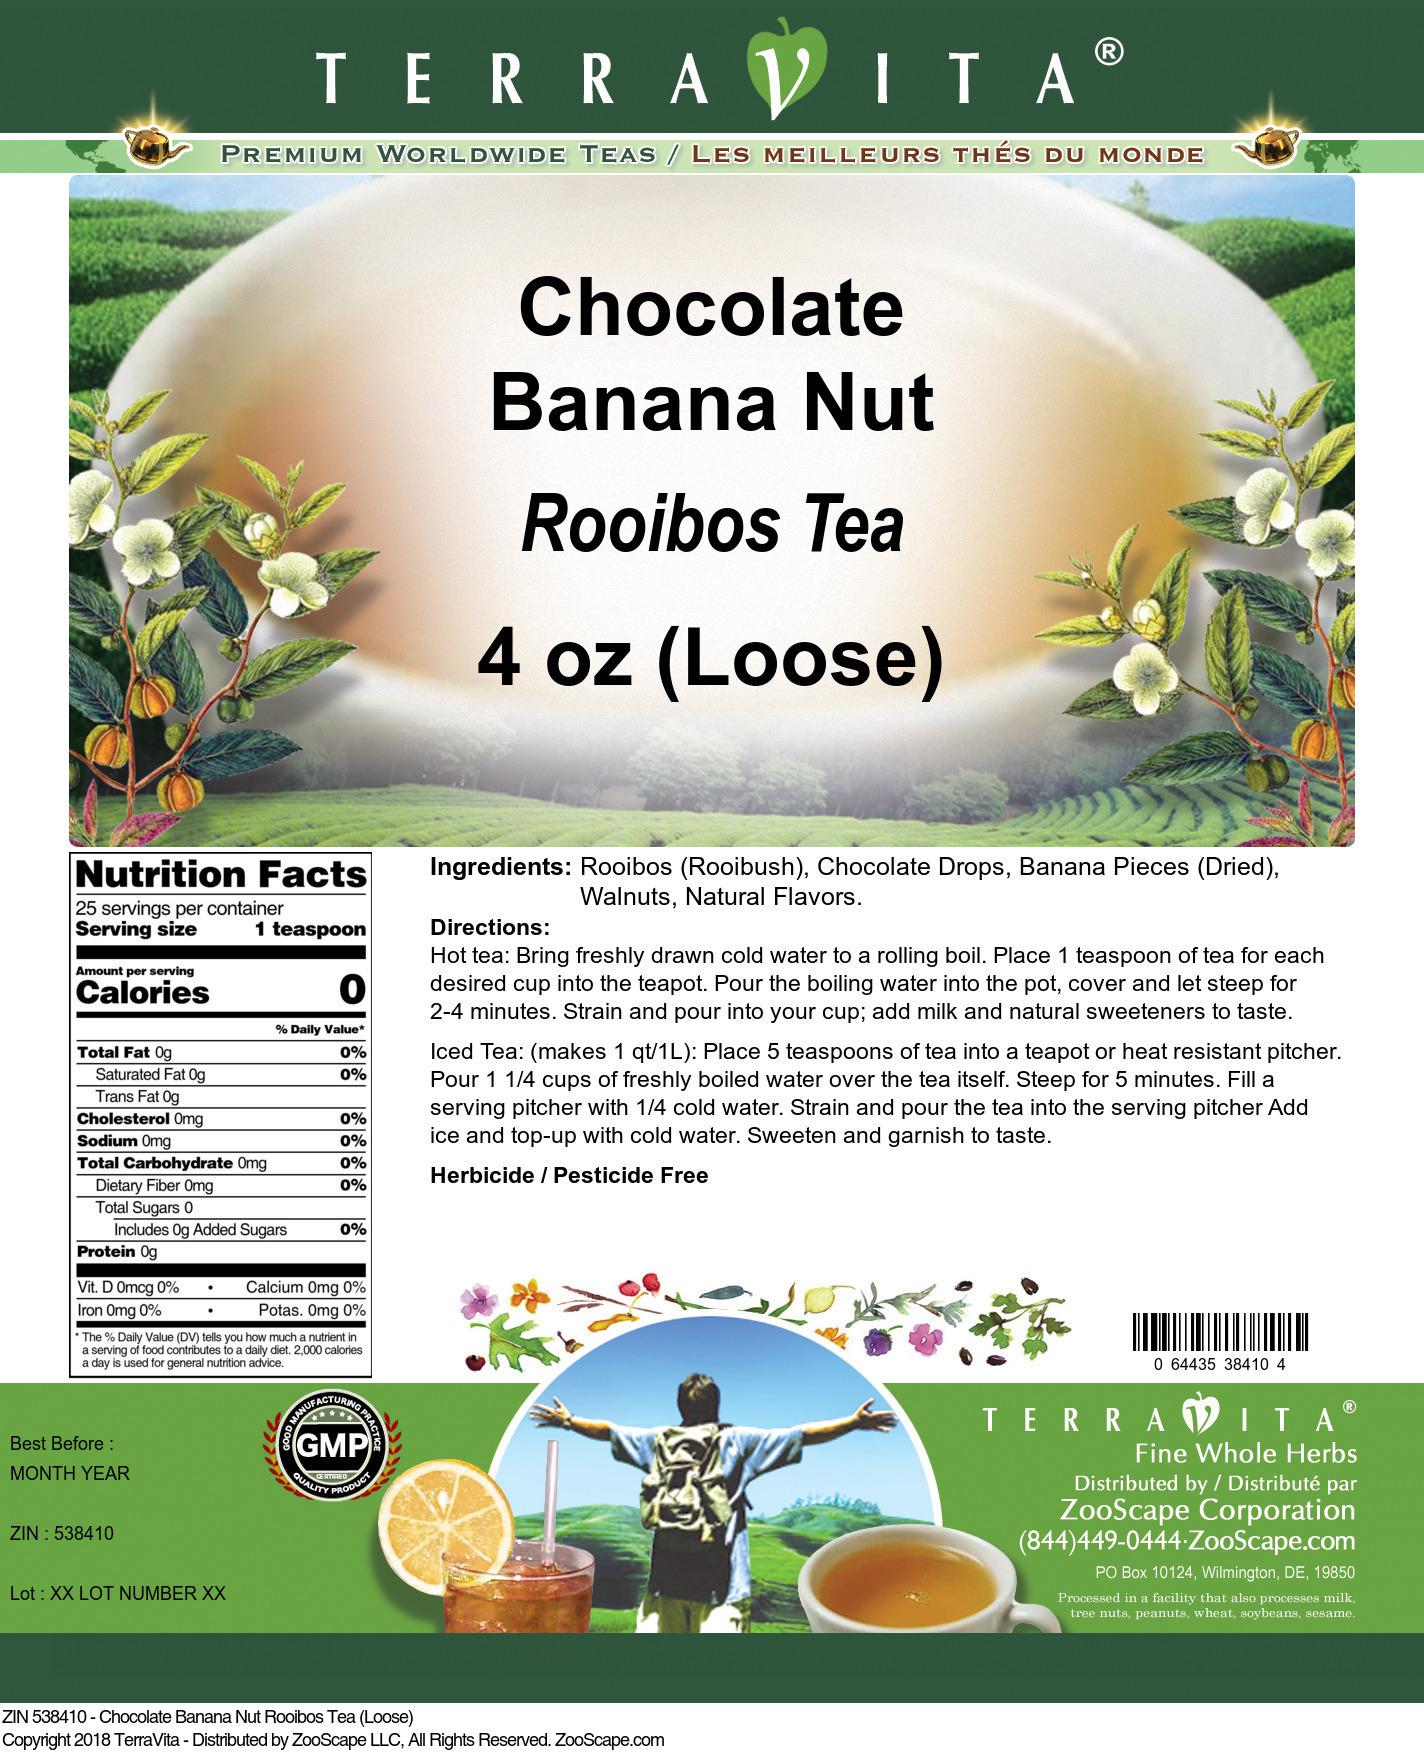 Chocolate Banana Nut Rooibos Tea (Loose)